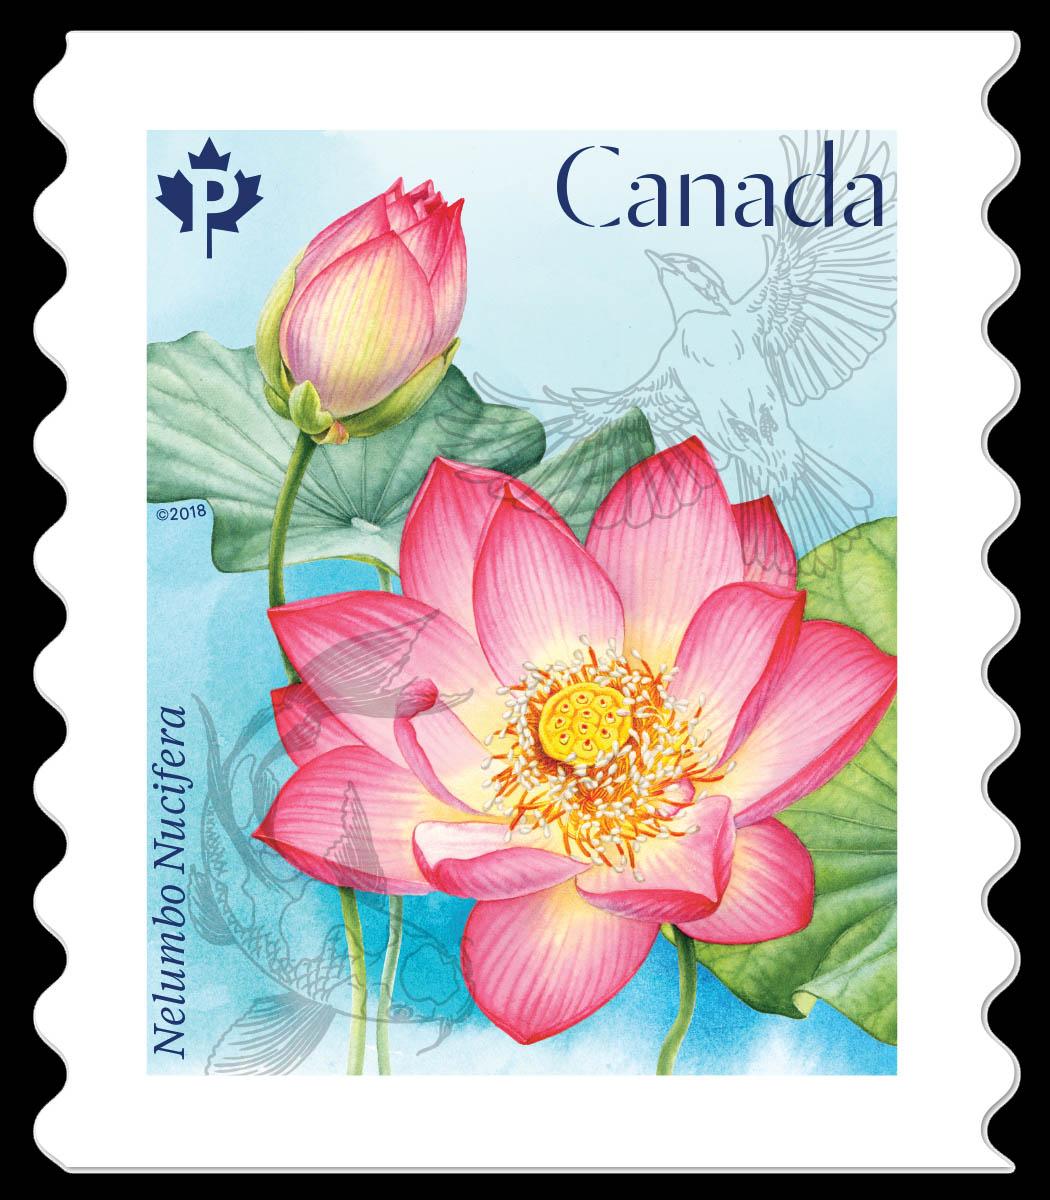 Sacred lotus nelumbo nucifera canada postage stamp lotus flowers sacred lotus nelumbo nucifera canada postage stamp lotus flowers izmirmasajfo